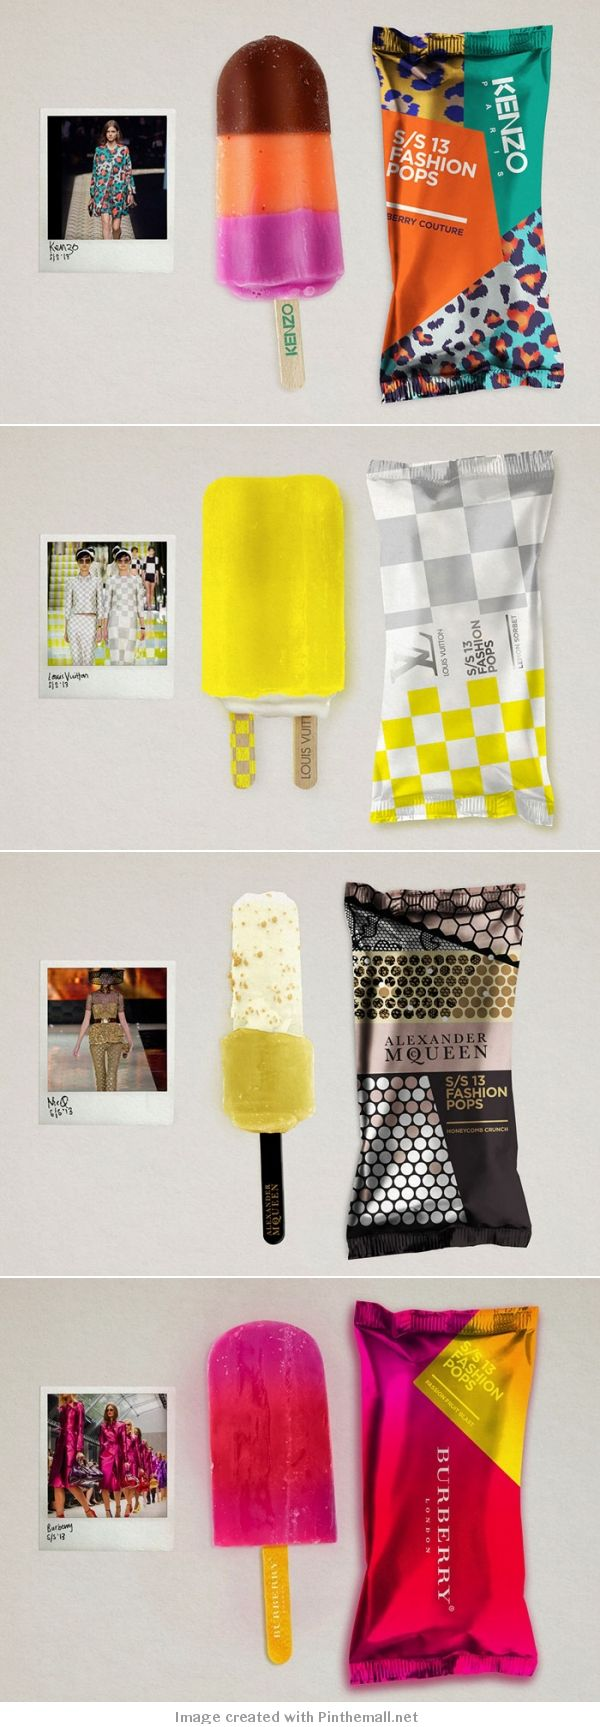 Spring Summer 13 Fashion Pops pin created by @san pan pan pan pan pan a team #2013 #toppin PD